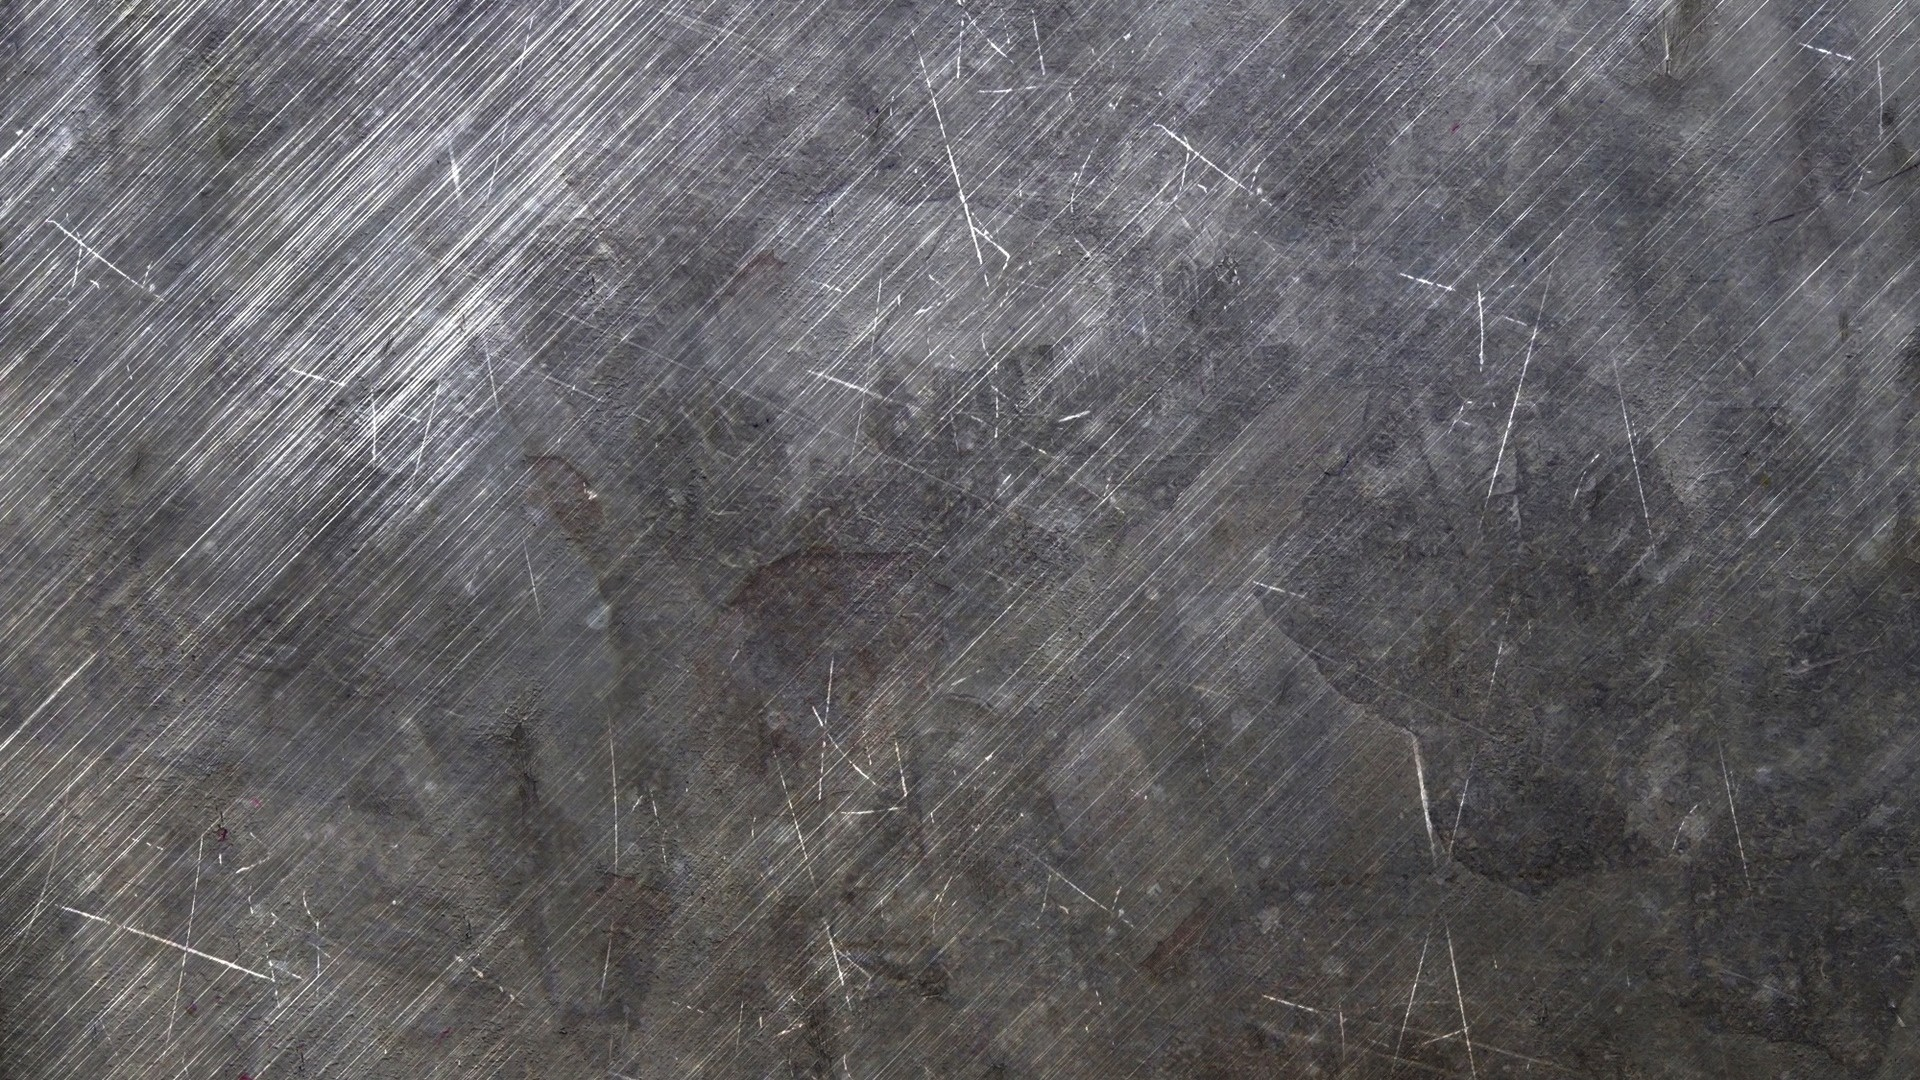 Metal Backgrounds Hd Wallpaper 63 Images